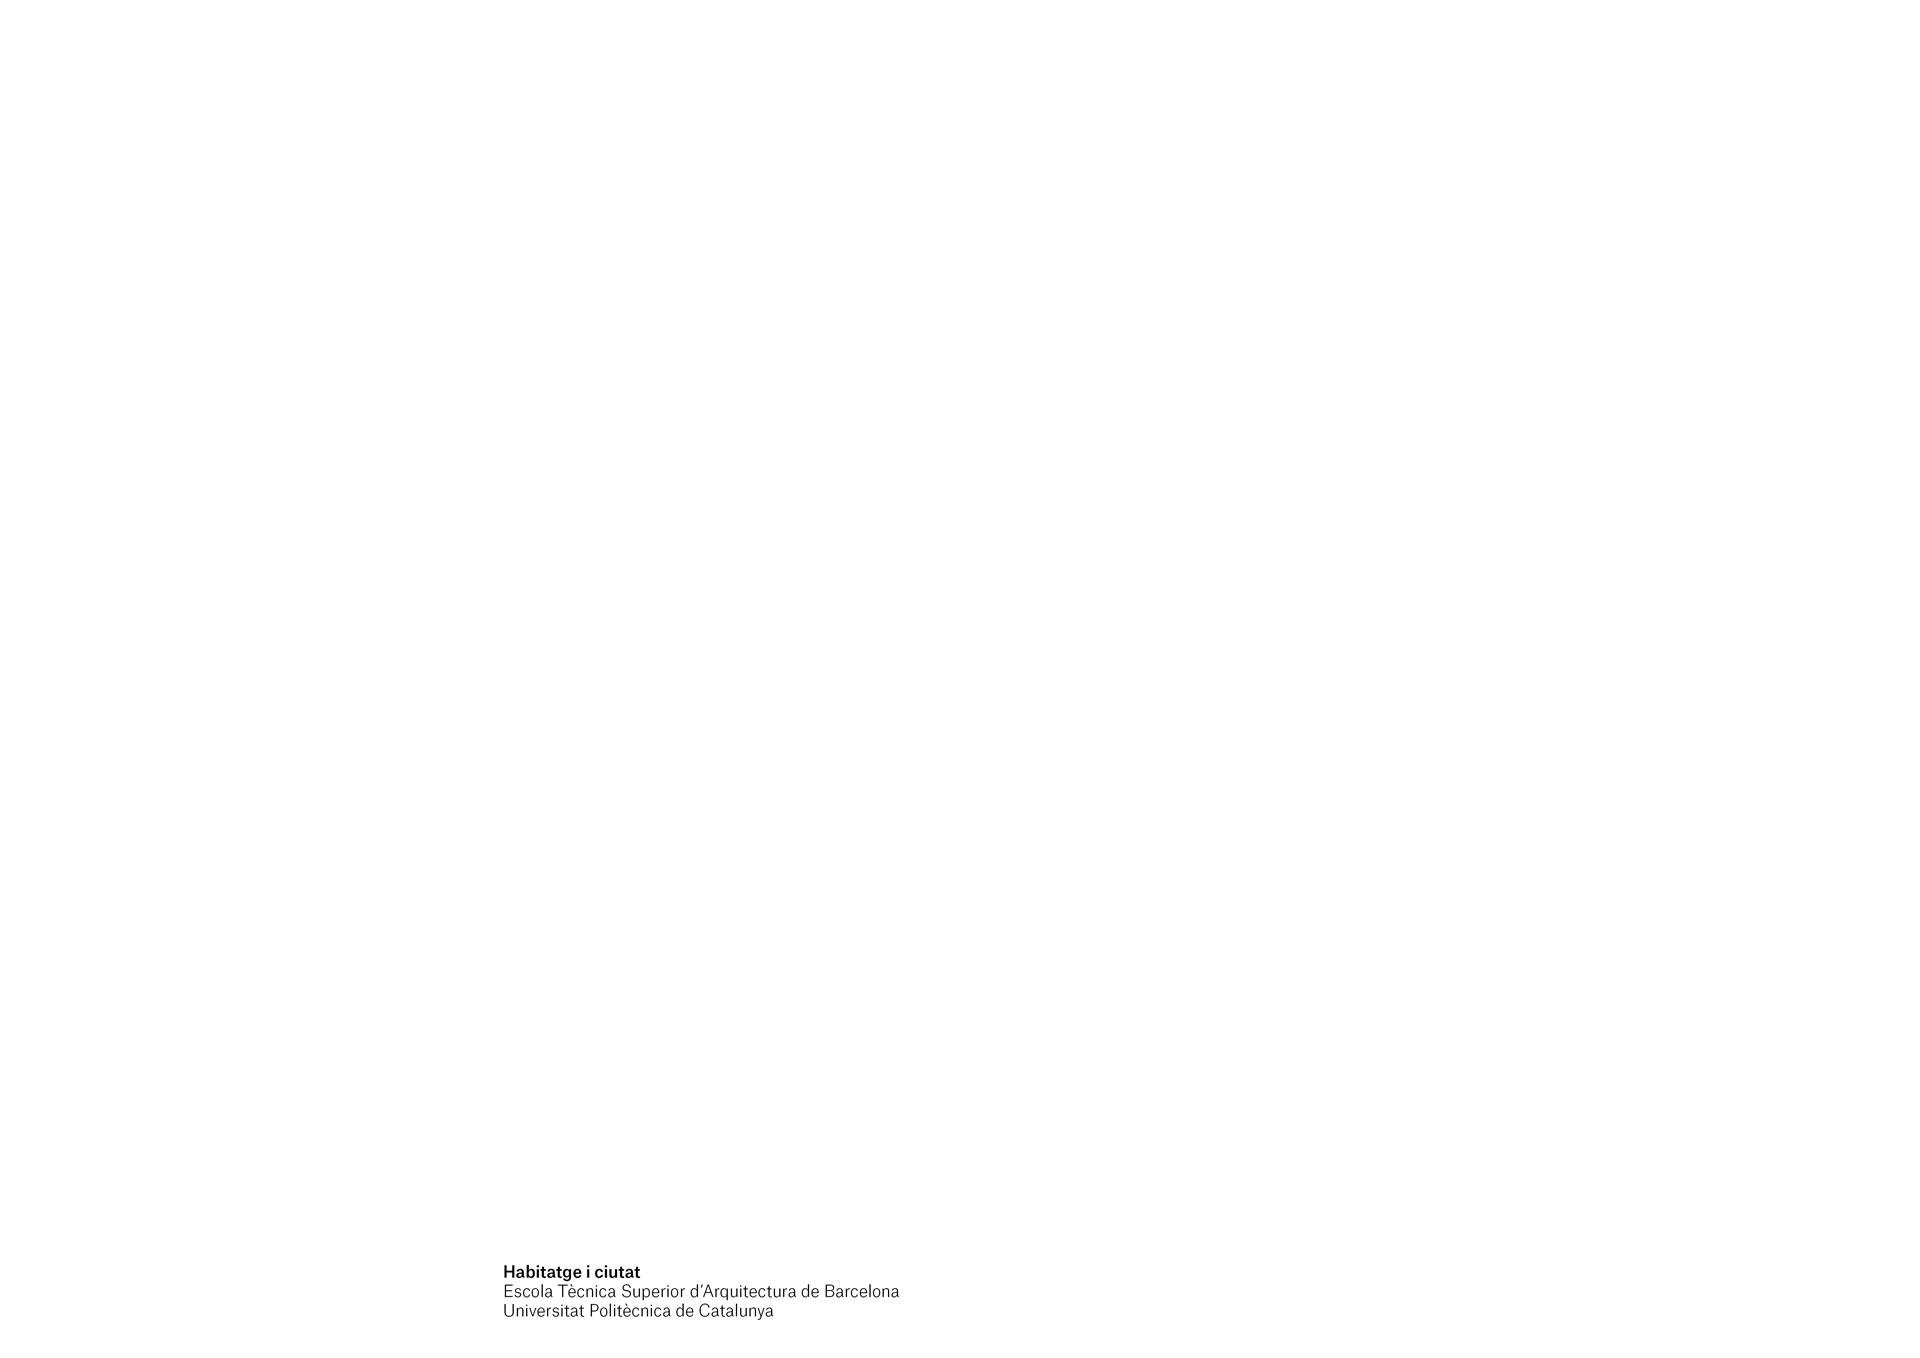 HiC-dossier-2021_1Q12